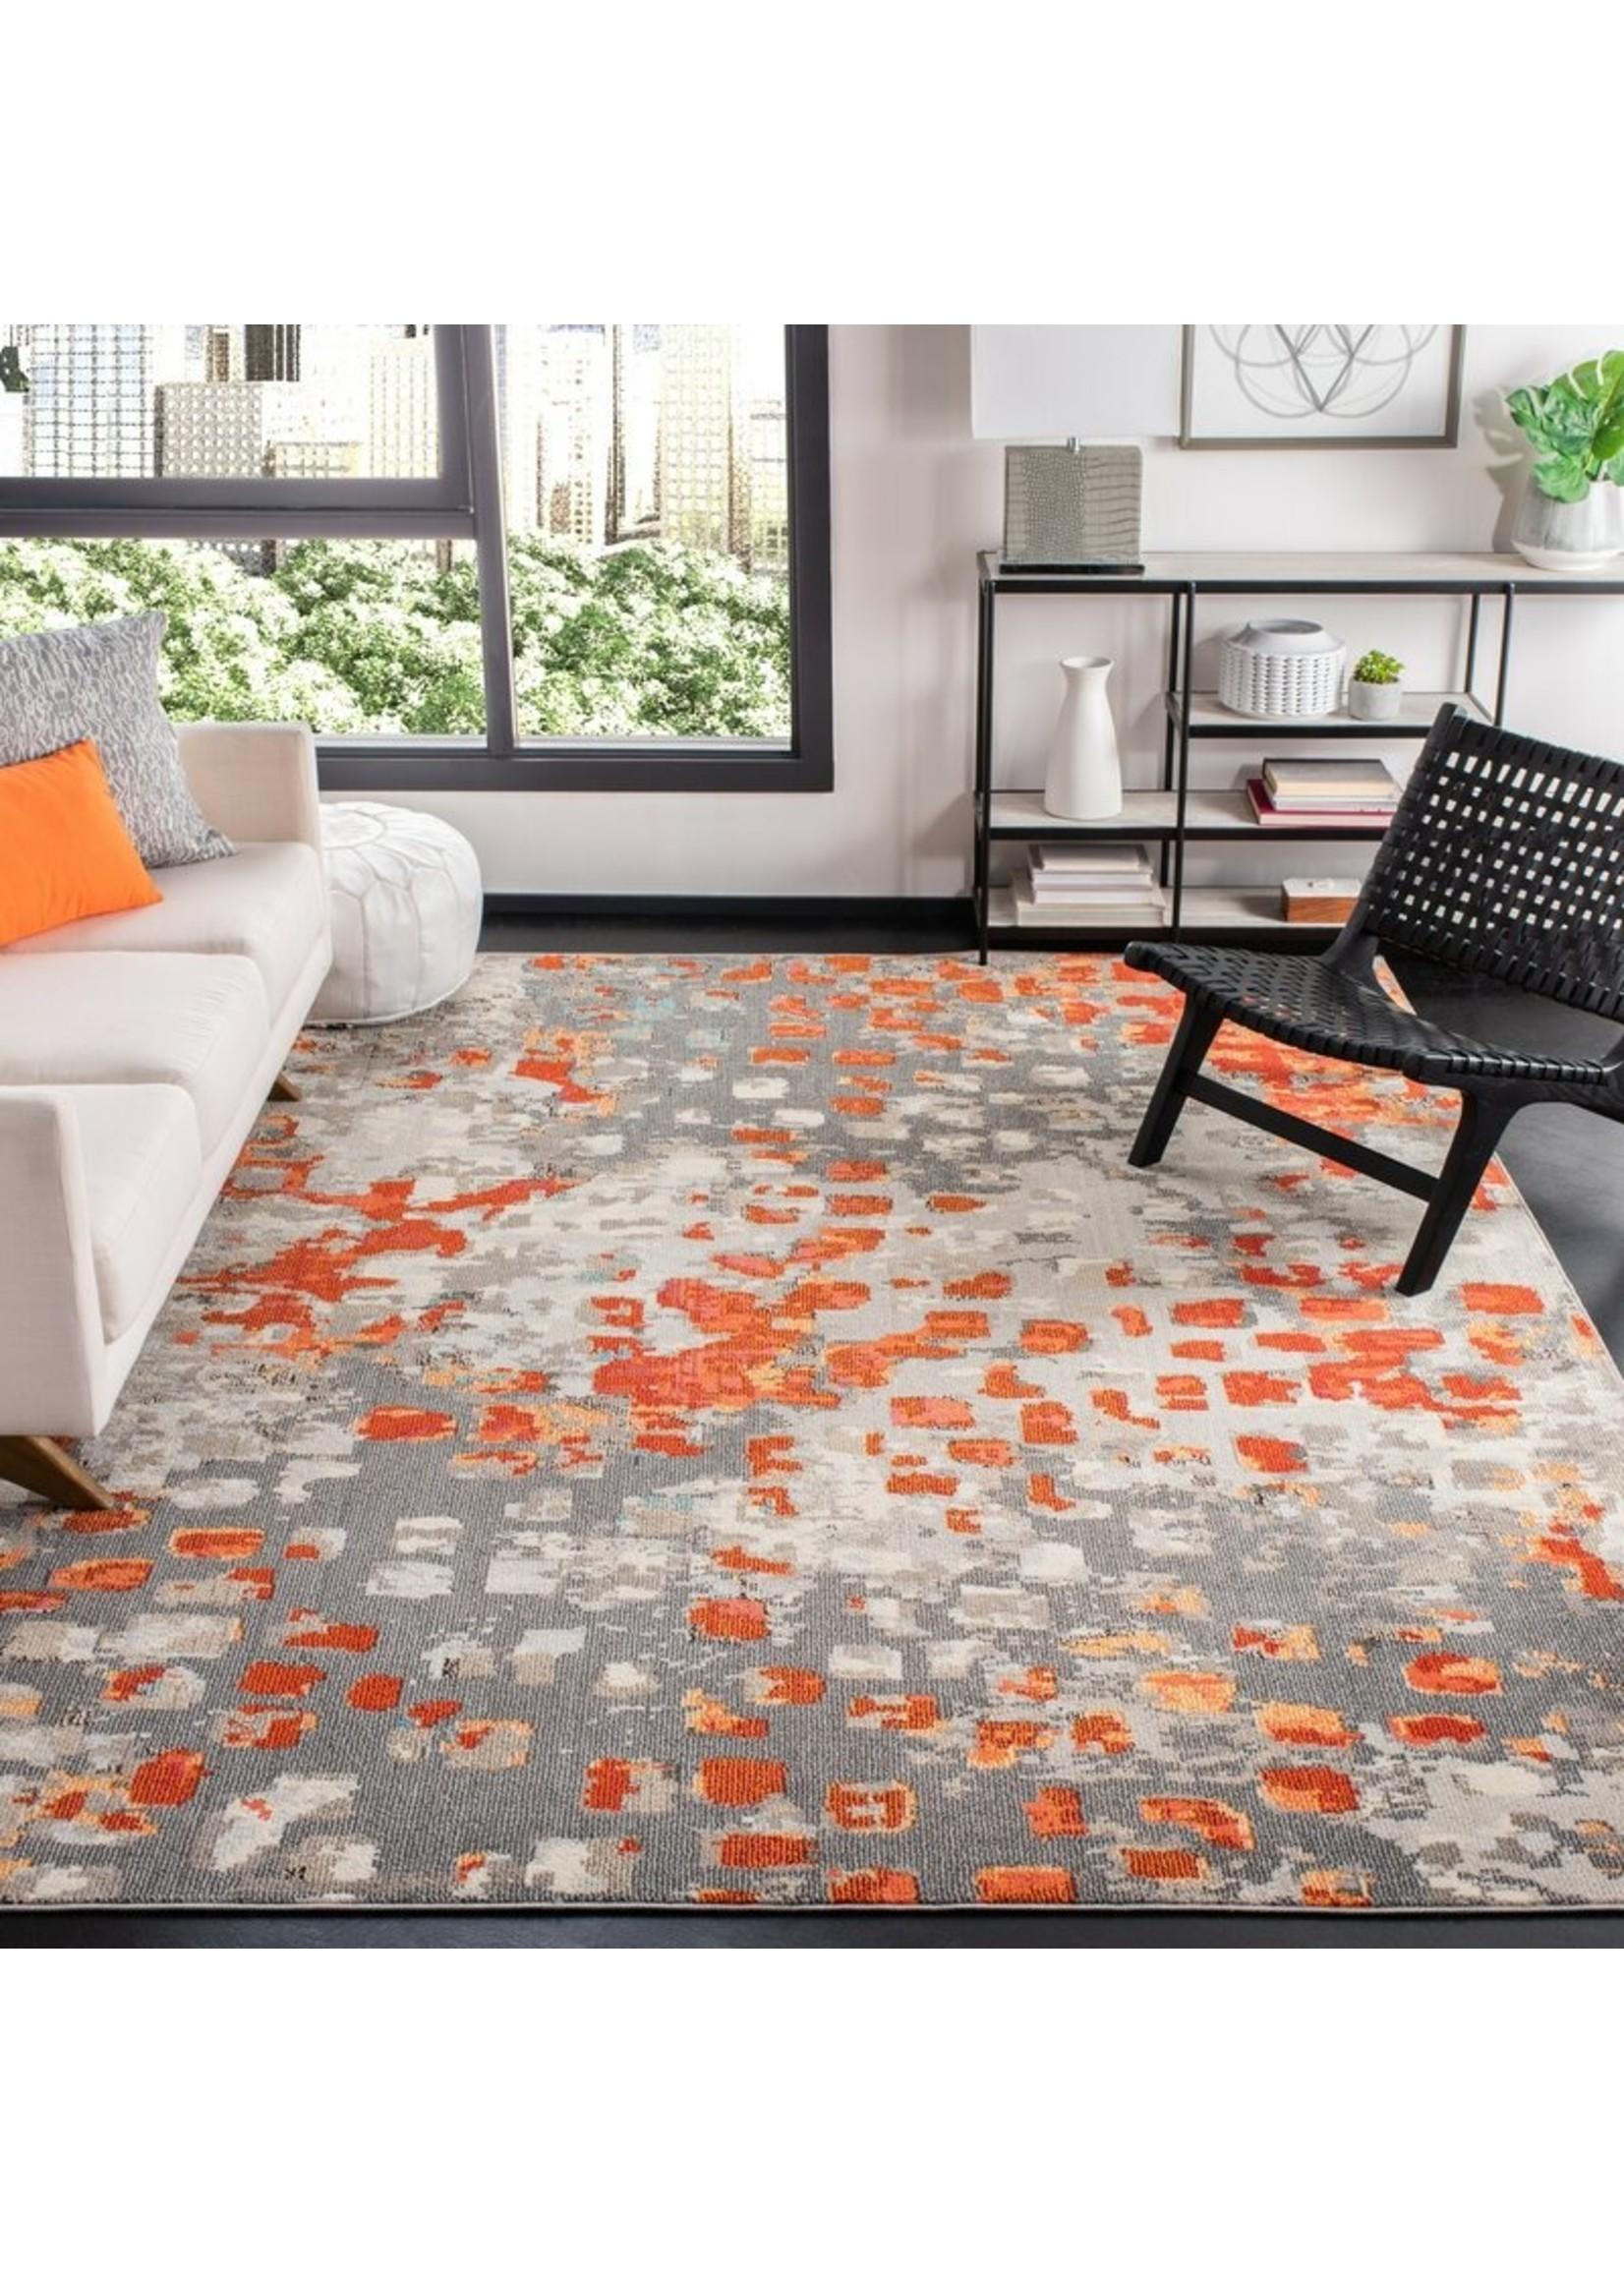 *12' x 18' - Poche Abstract Orange Area Rug